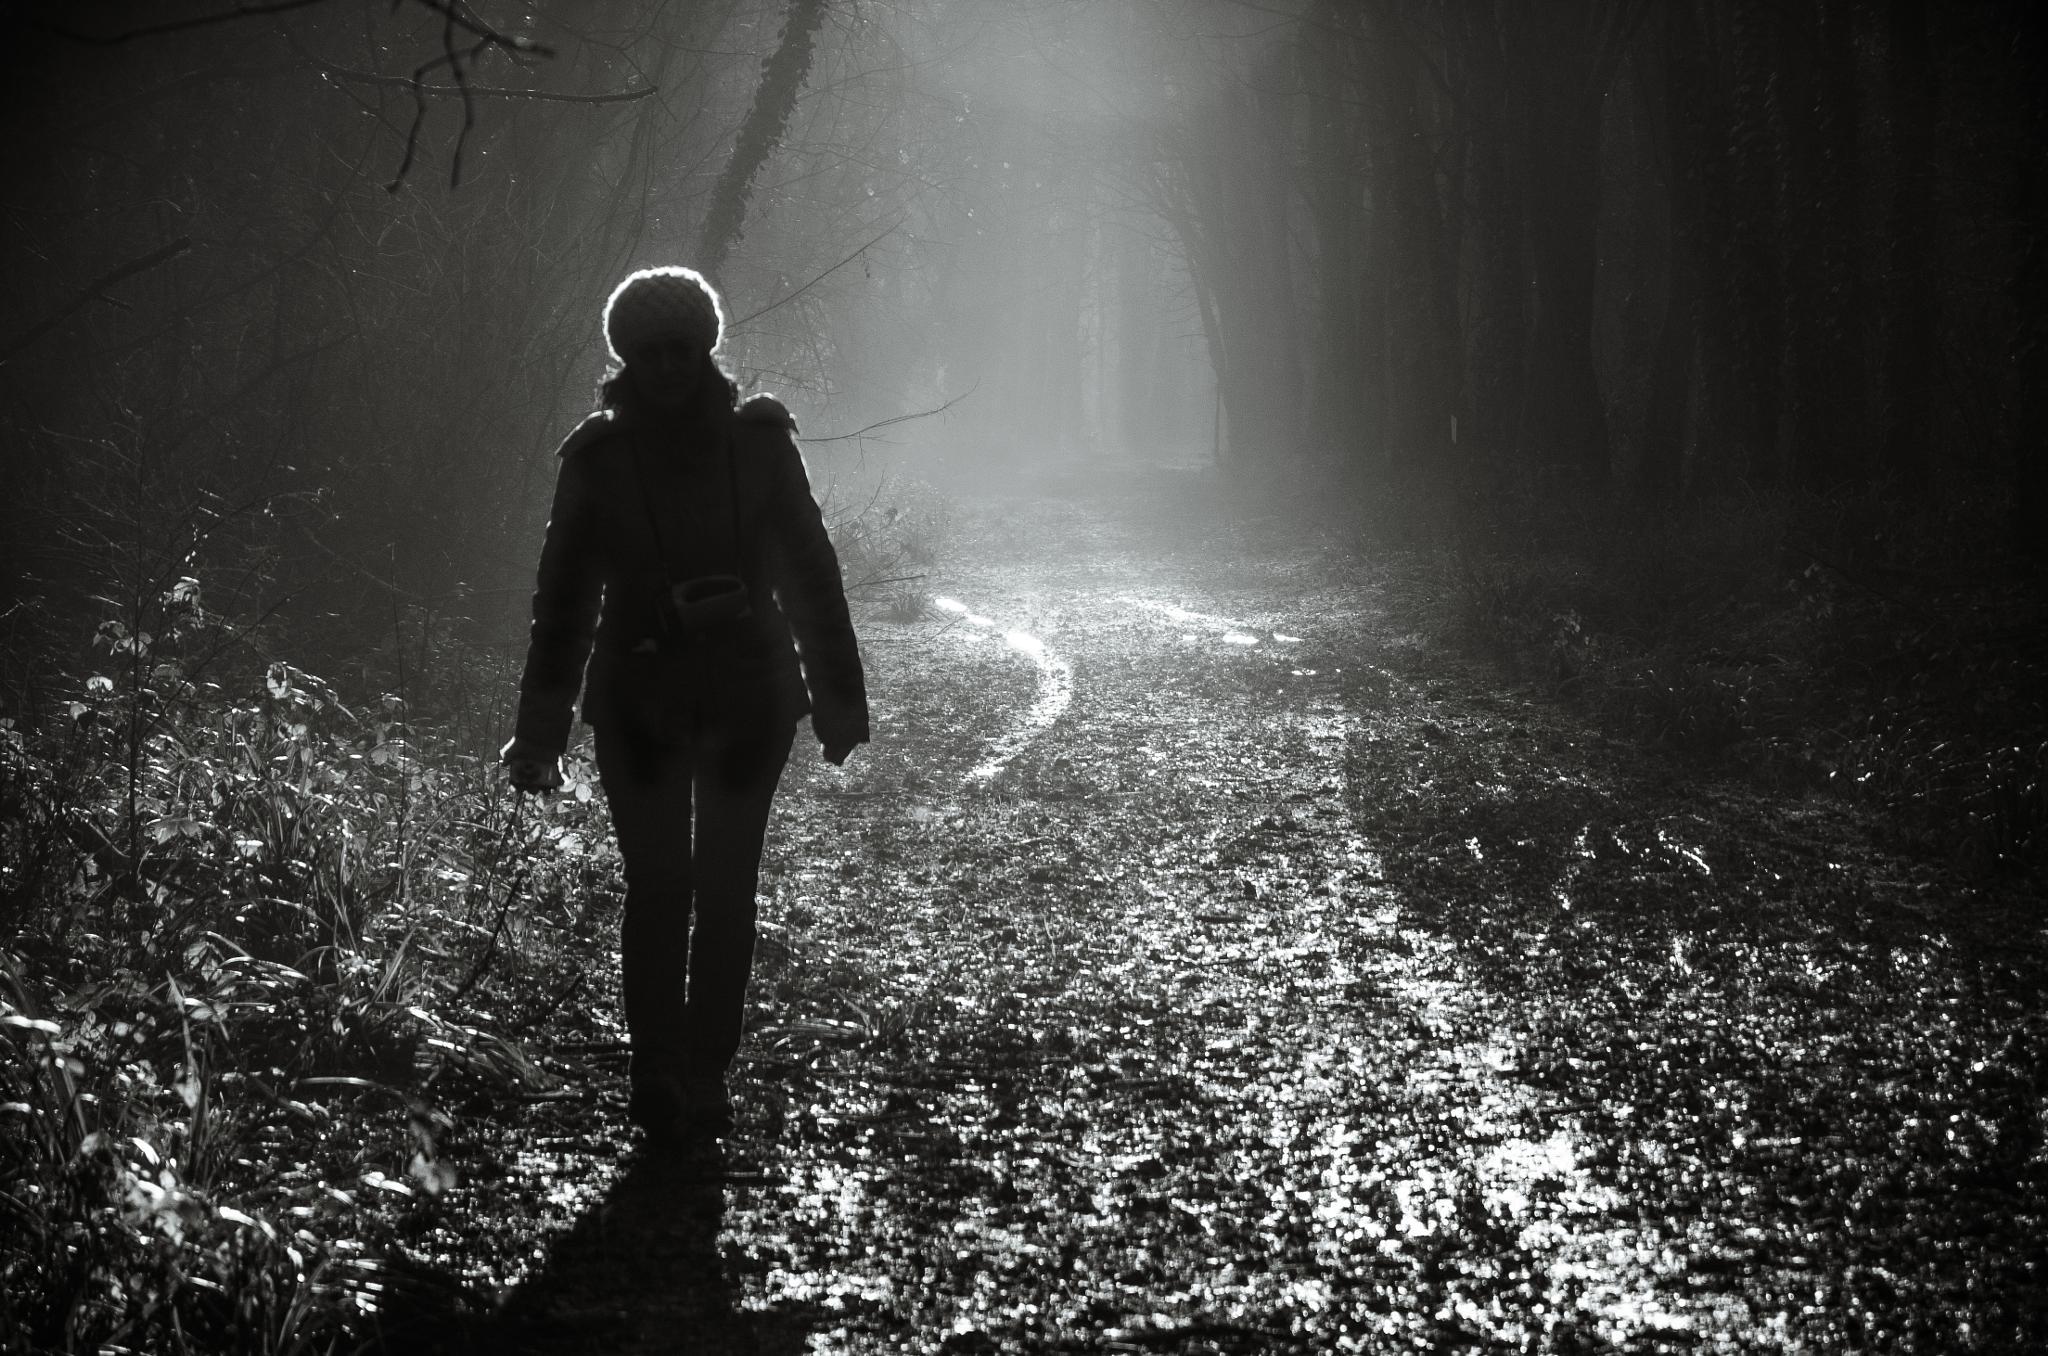 Walking from the light by Mirco Balboni